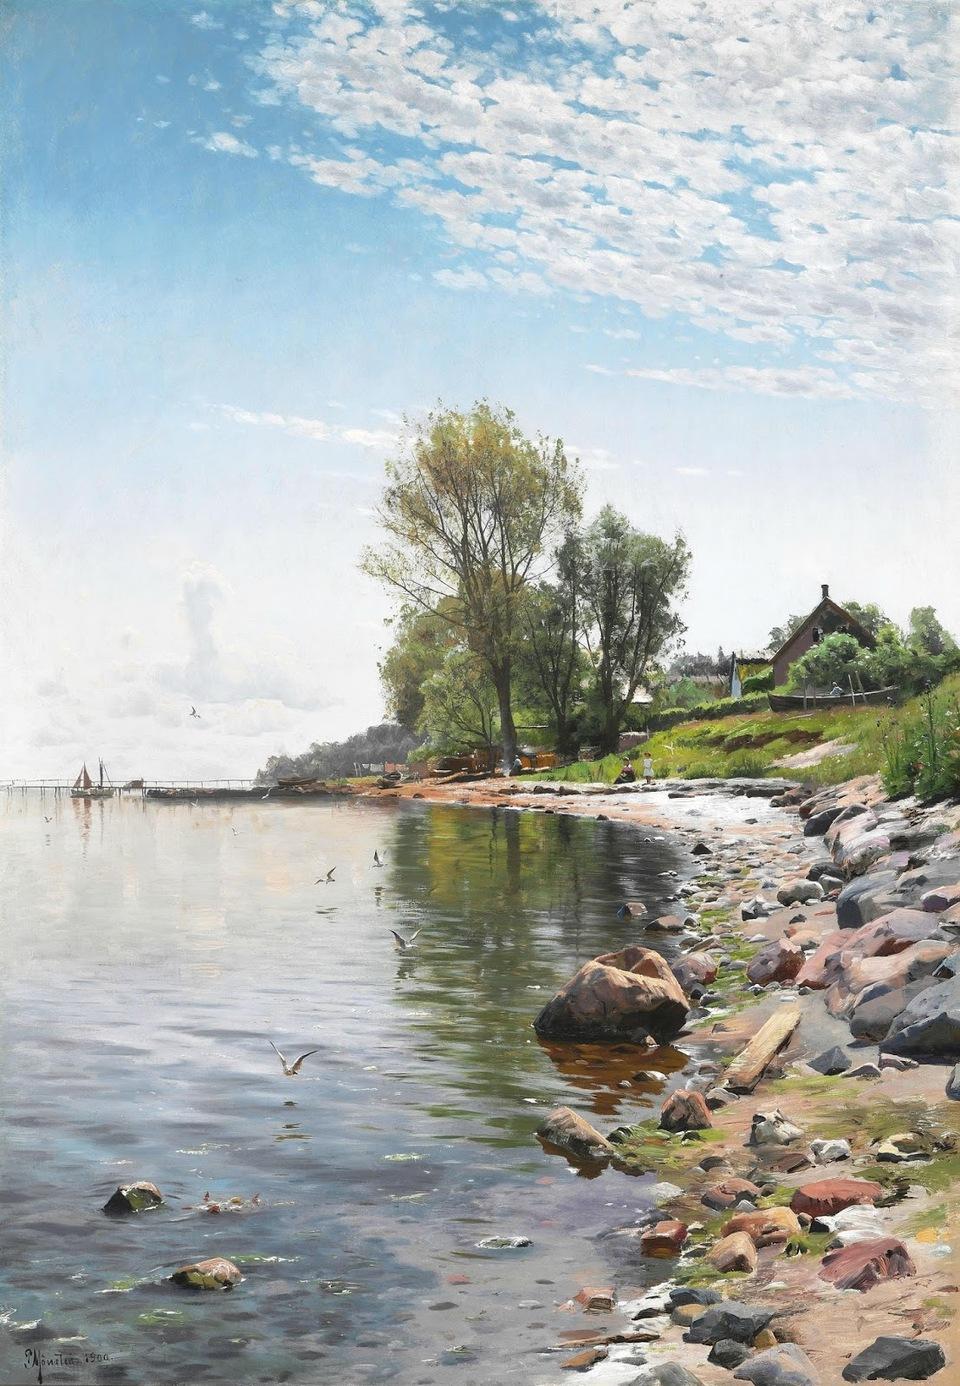 Художник Петер Мёрк Мёнстед (Peder Mørk Mønsted), 1859 -1941. Дания.Часть 3